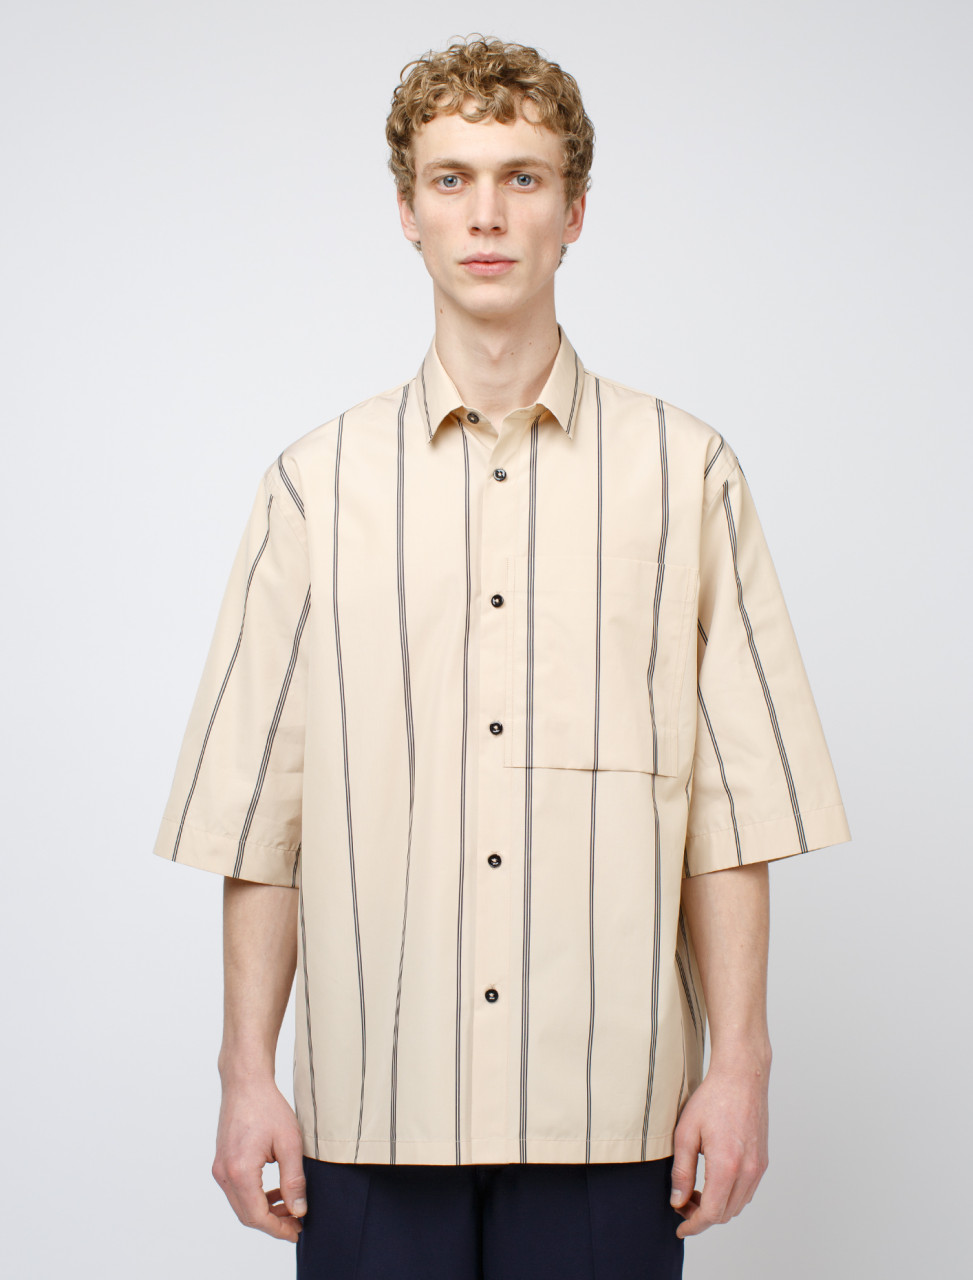 Shirt in Open Beige